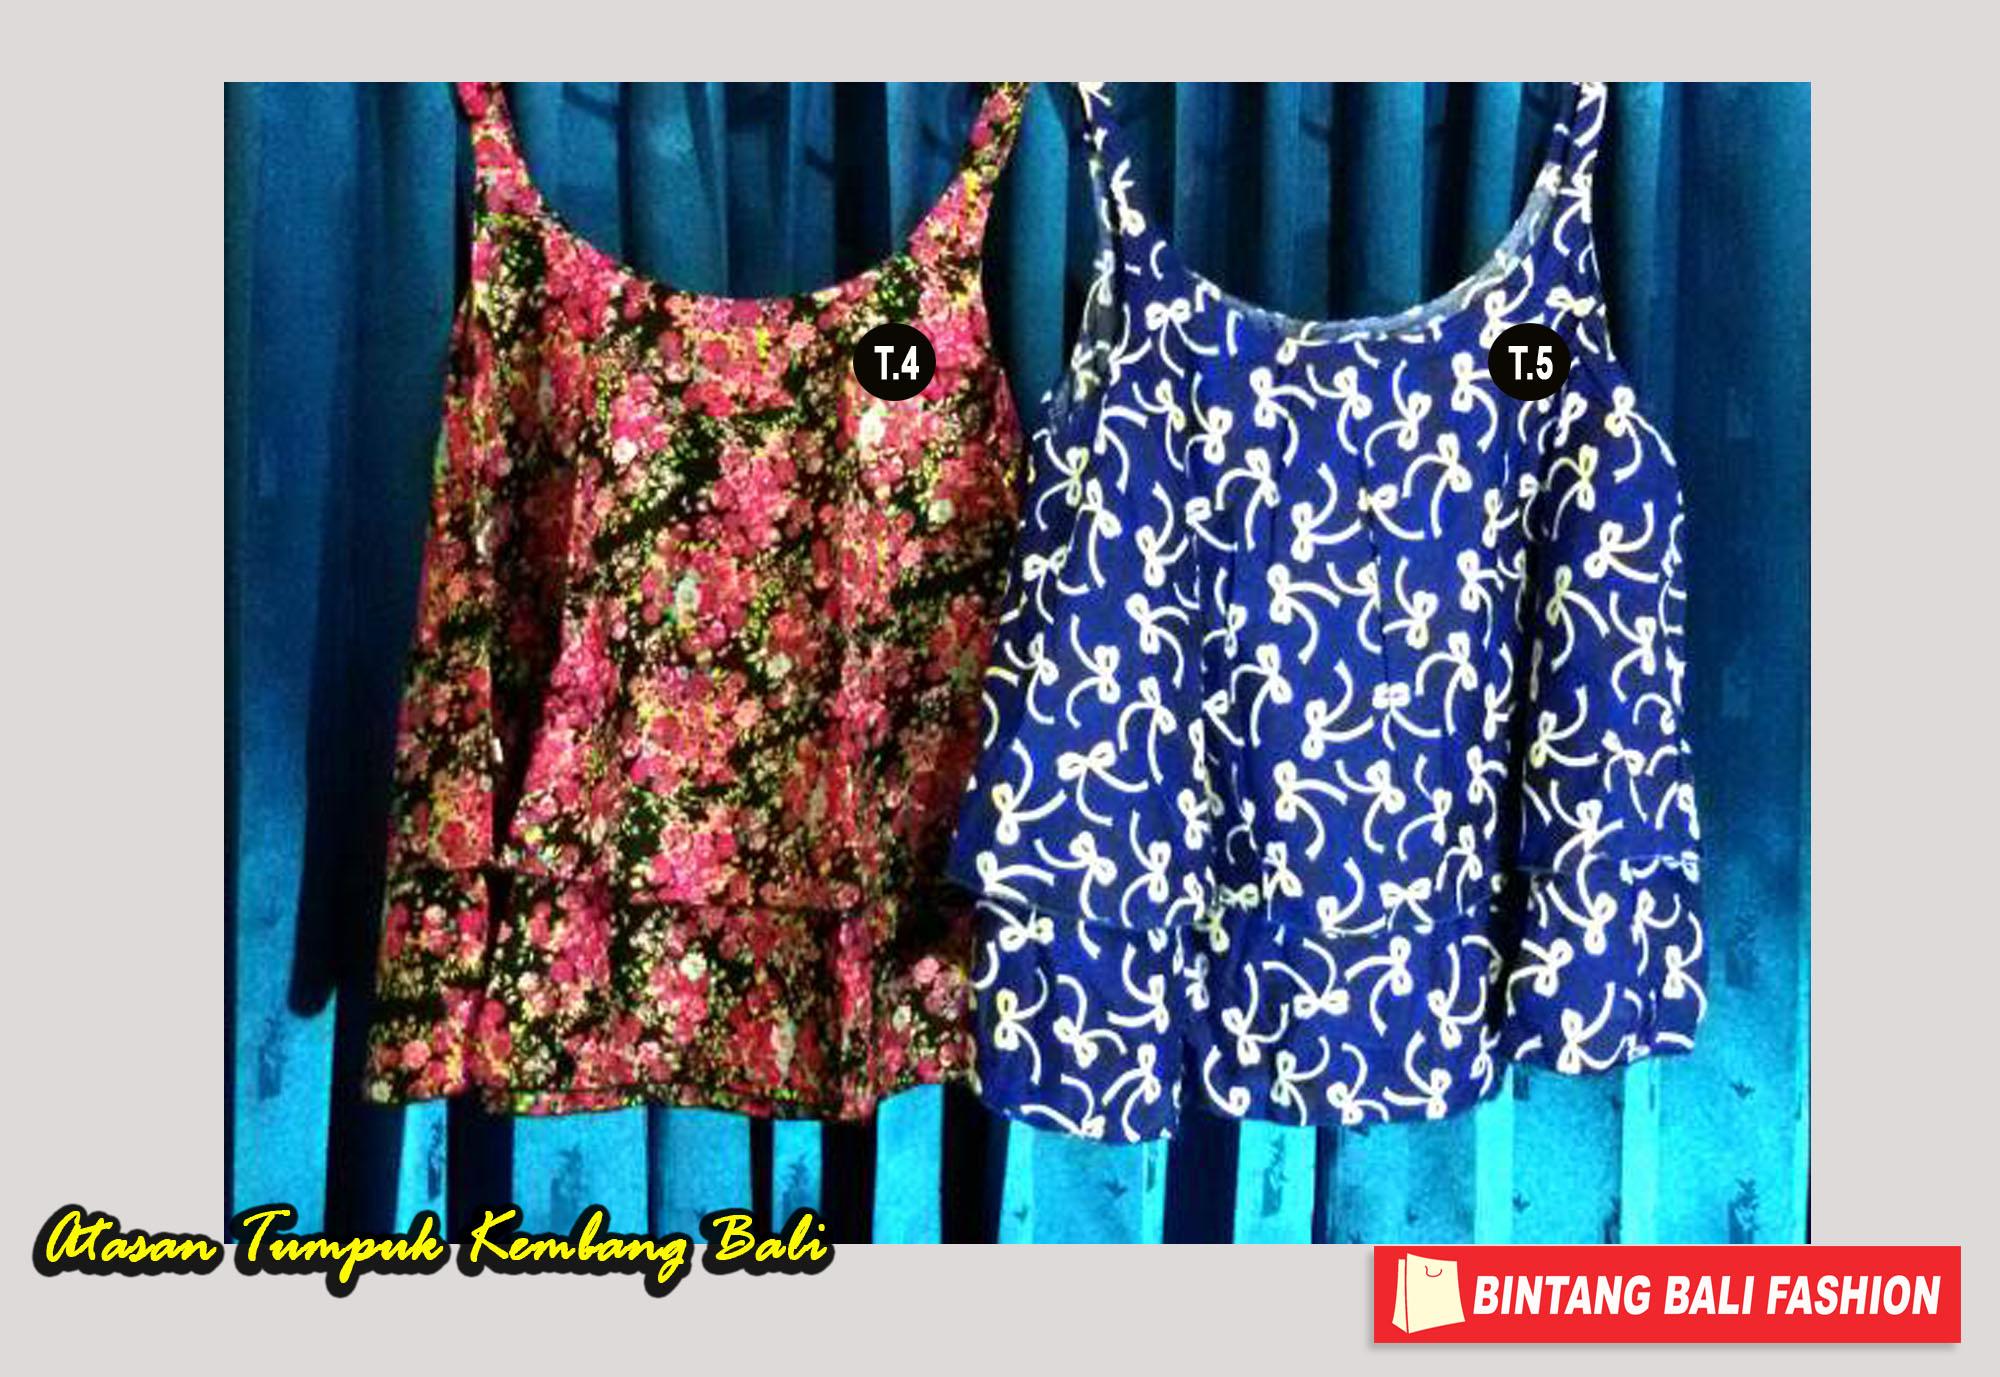 Jual Baju Bali Atasan Tumpuk Tali Motif Kembang